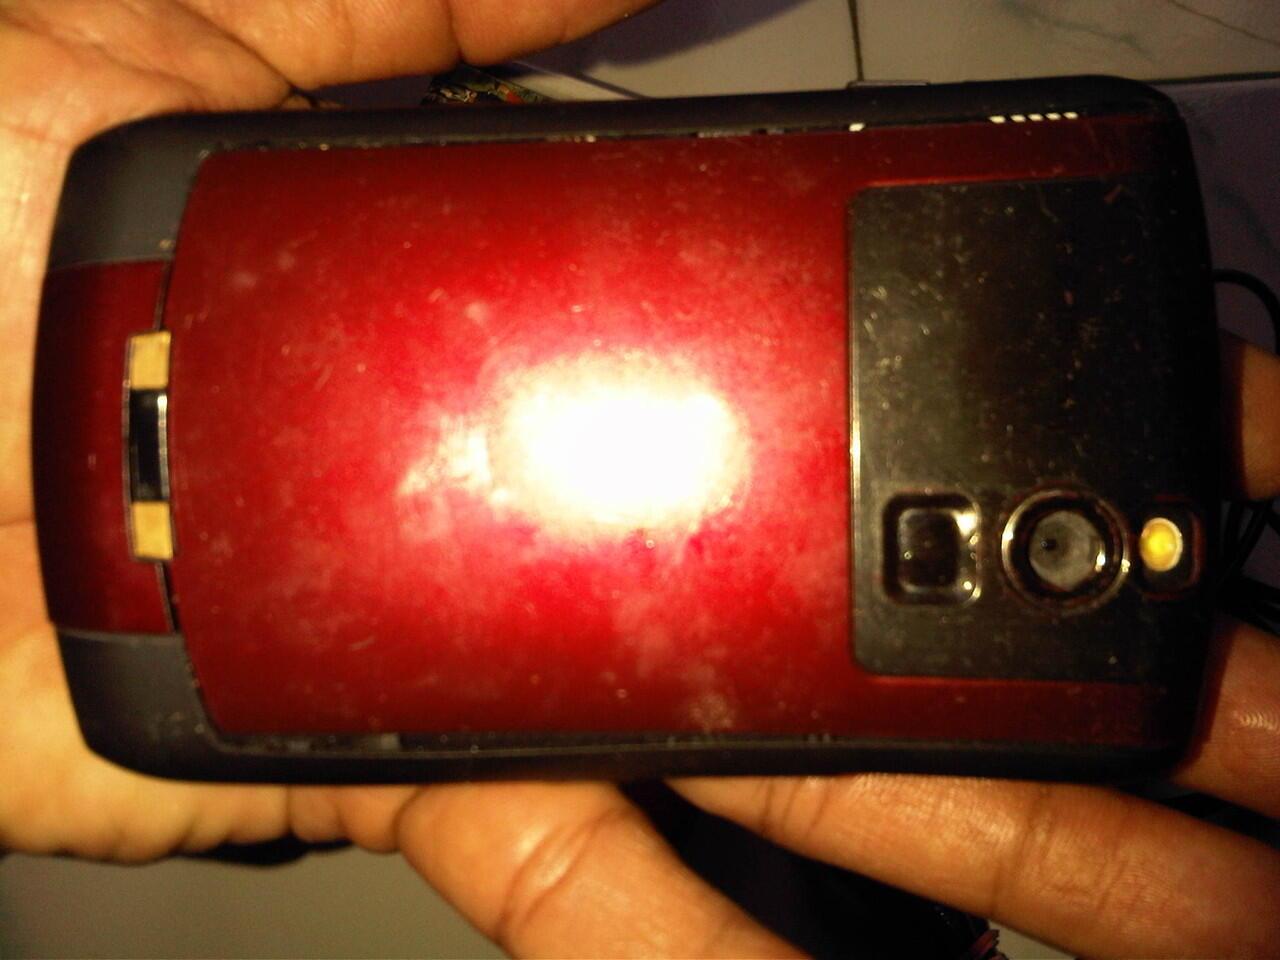 blacberry 8310 merah normal,,